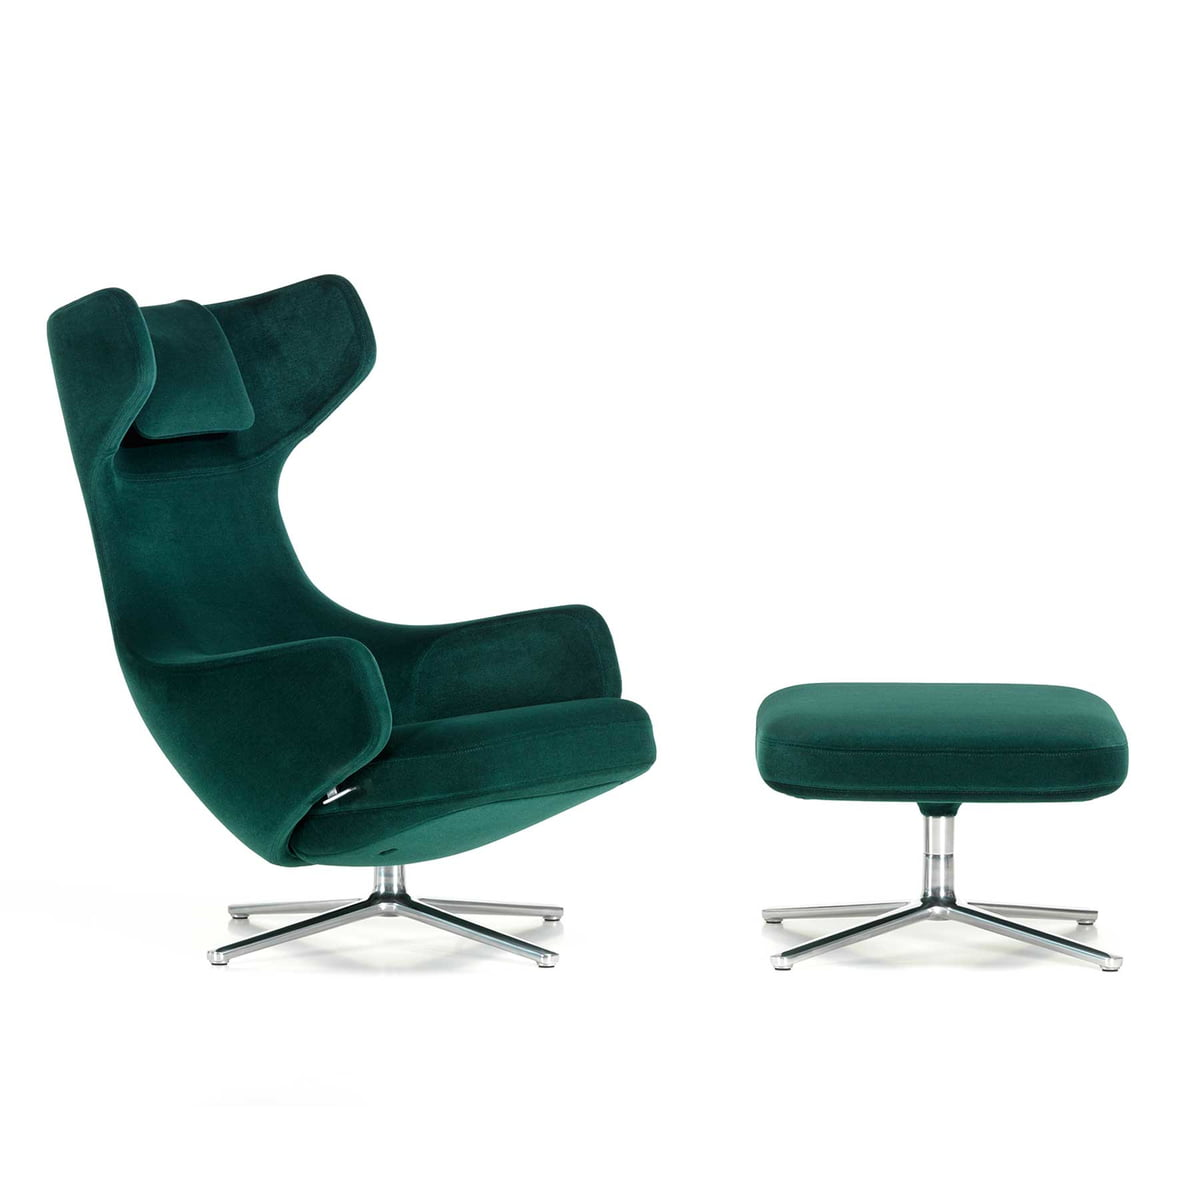 Grand repos fauteuil ottomane vitra for Fauteuil vitra prix